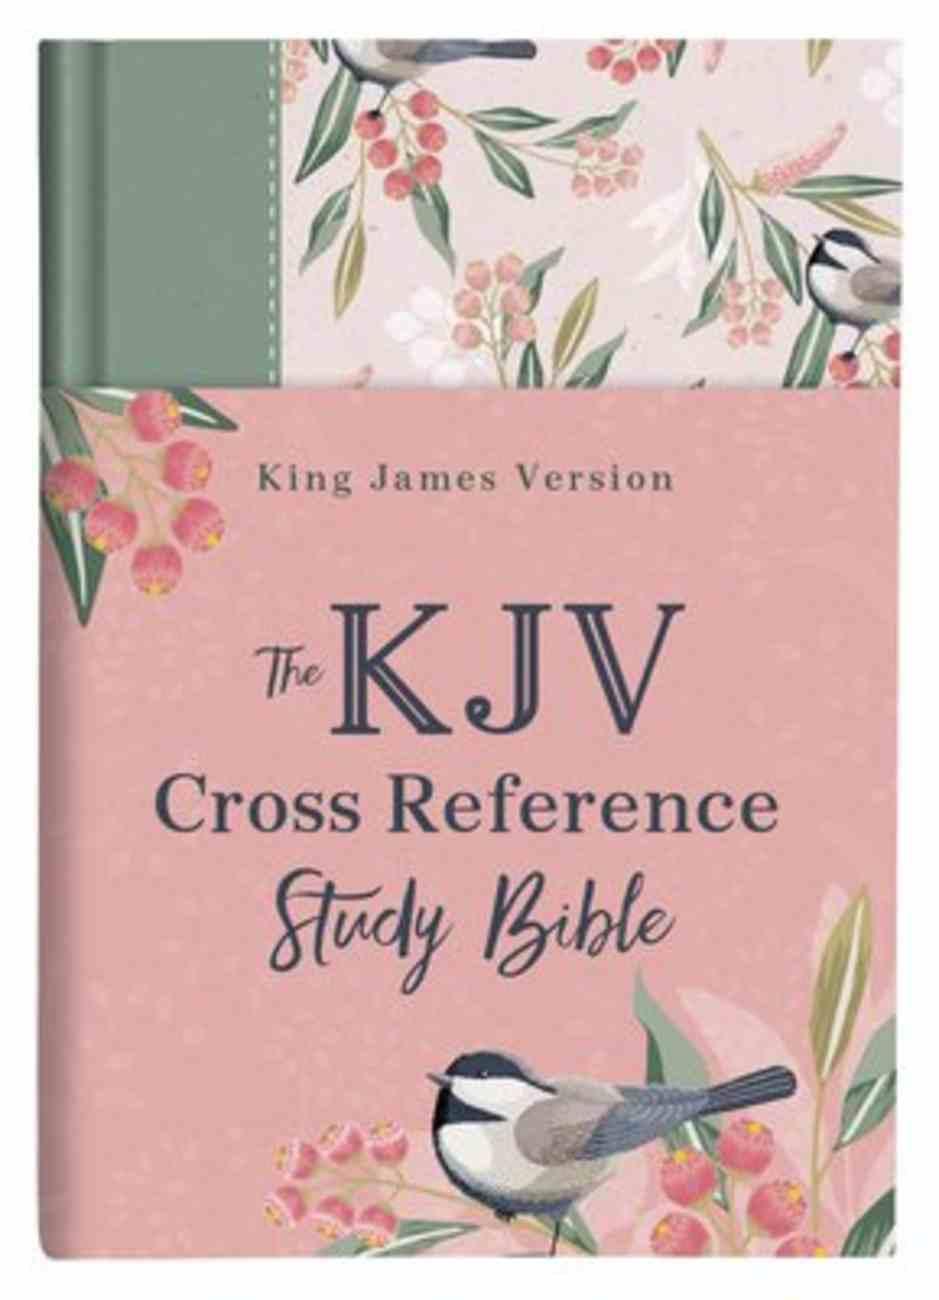 KJV Cross Reference Study Bible Women's Edition Sage Songbird (Red Letter Edition) Hardback